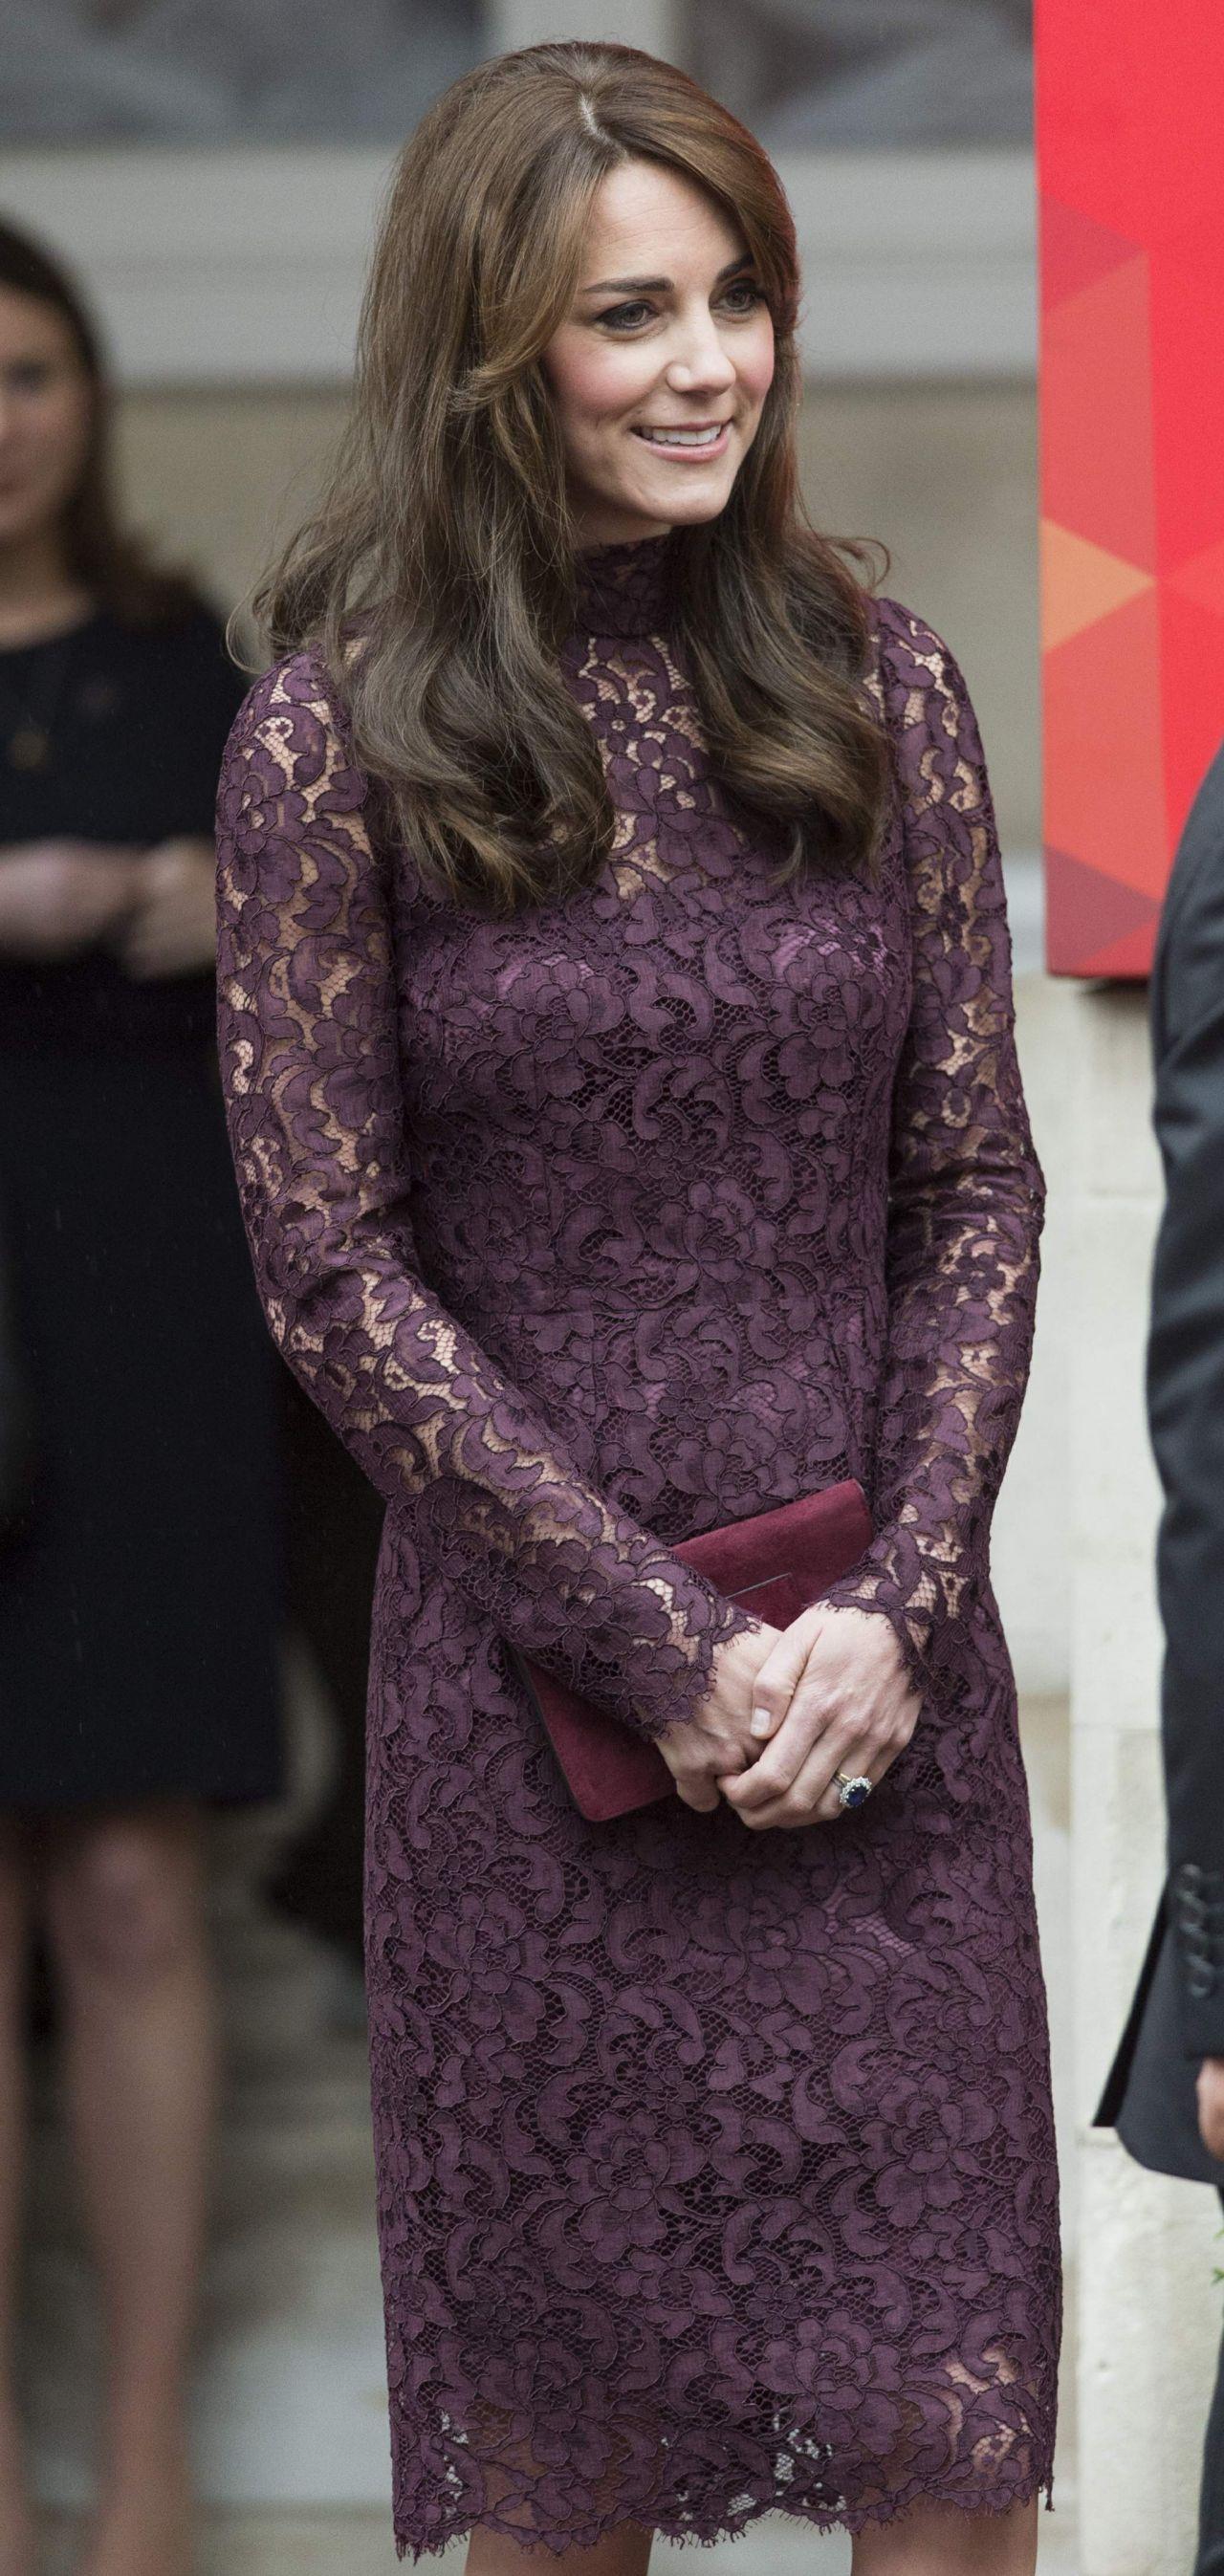 Royal wedding: Prince William to marry Kate Middleton